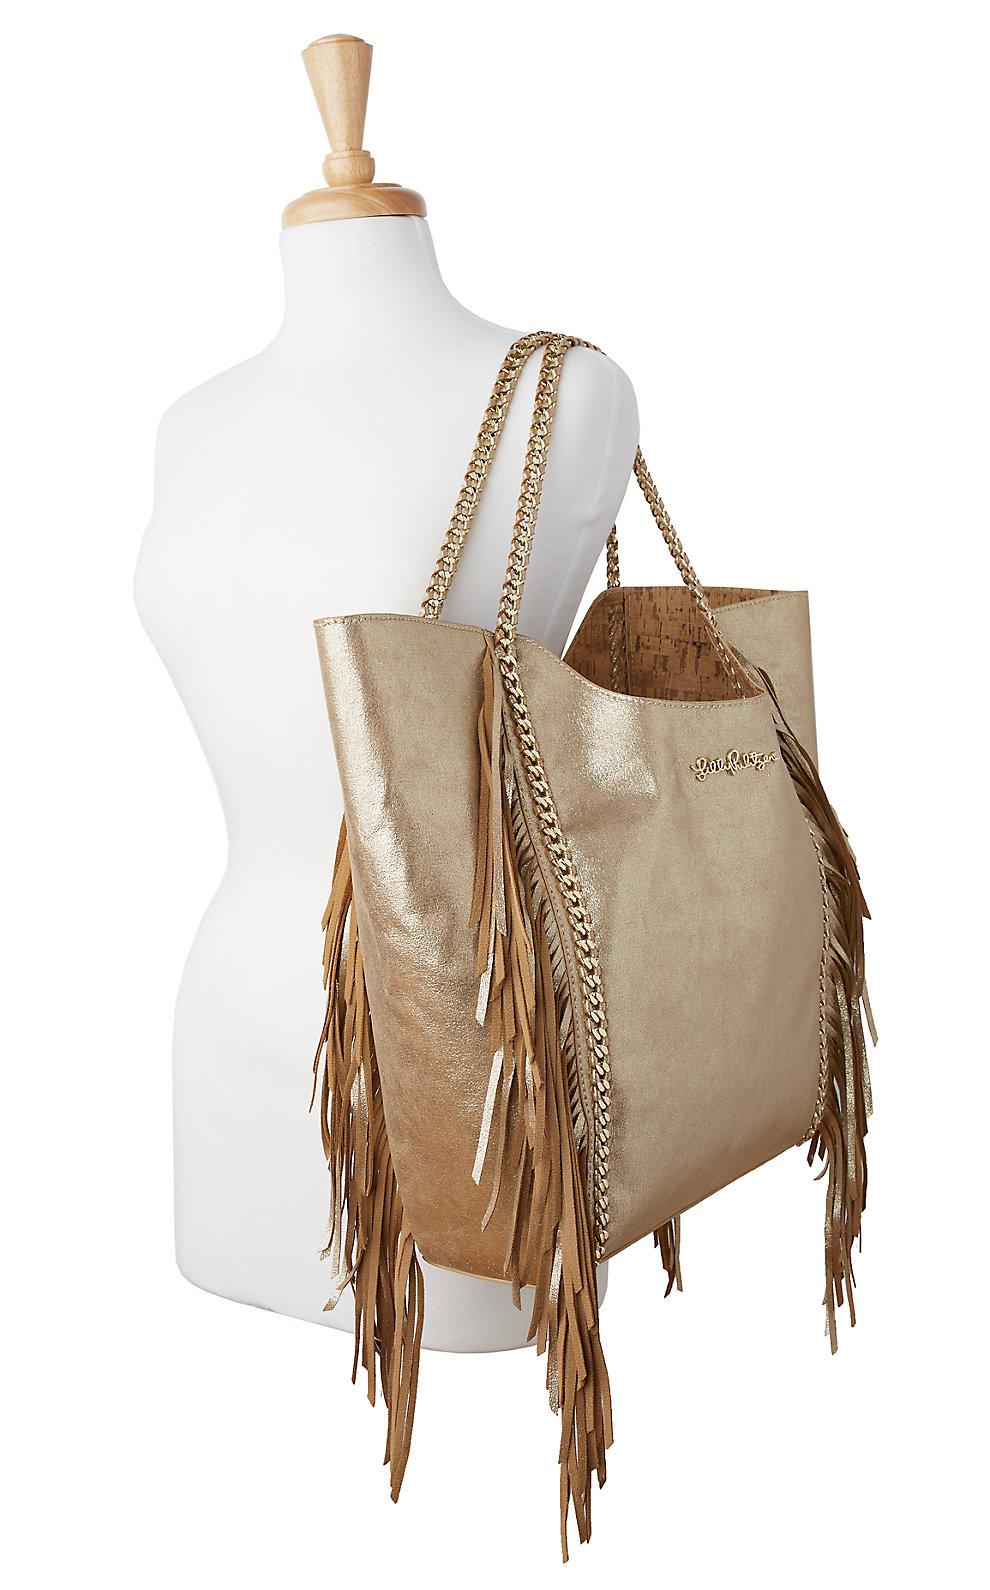 Lilly Pulitzer Fringe Cruise Tote Bag